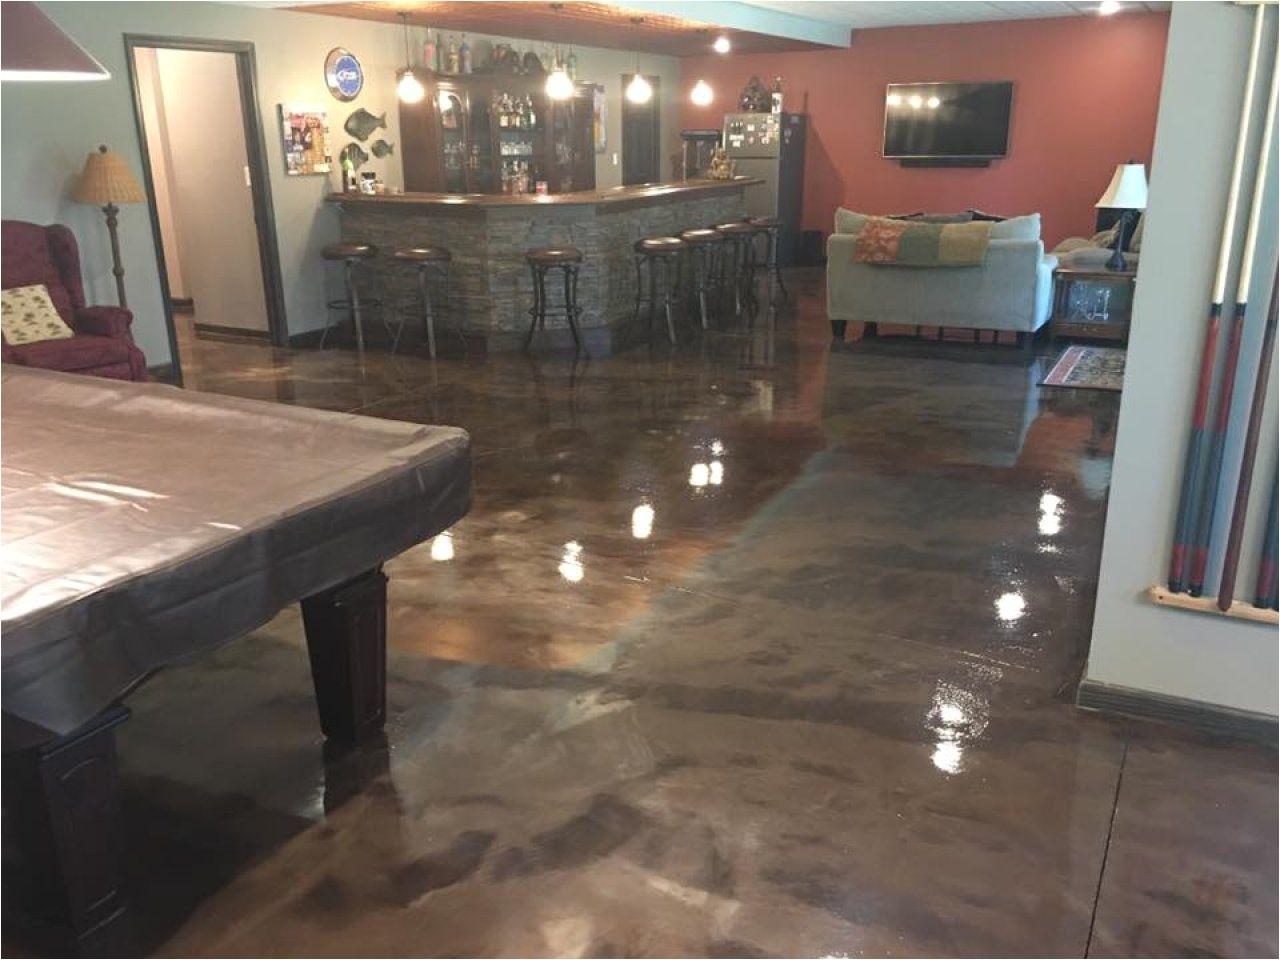 Blue Metallic Epoxy Floor Metallic Marble Epoxied Basement Floor In Peoria Illinois